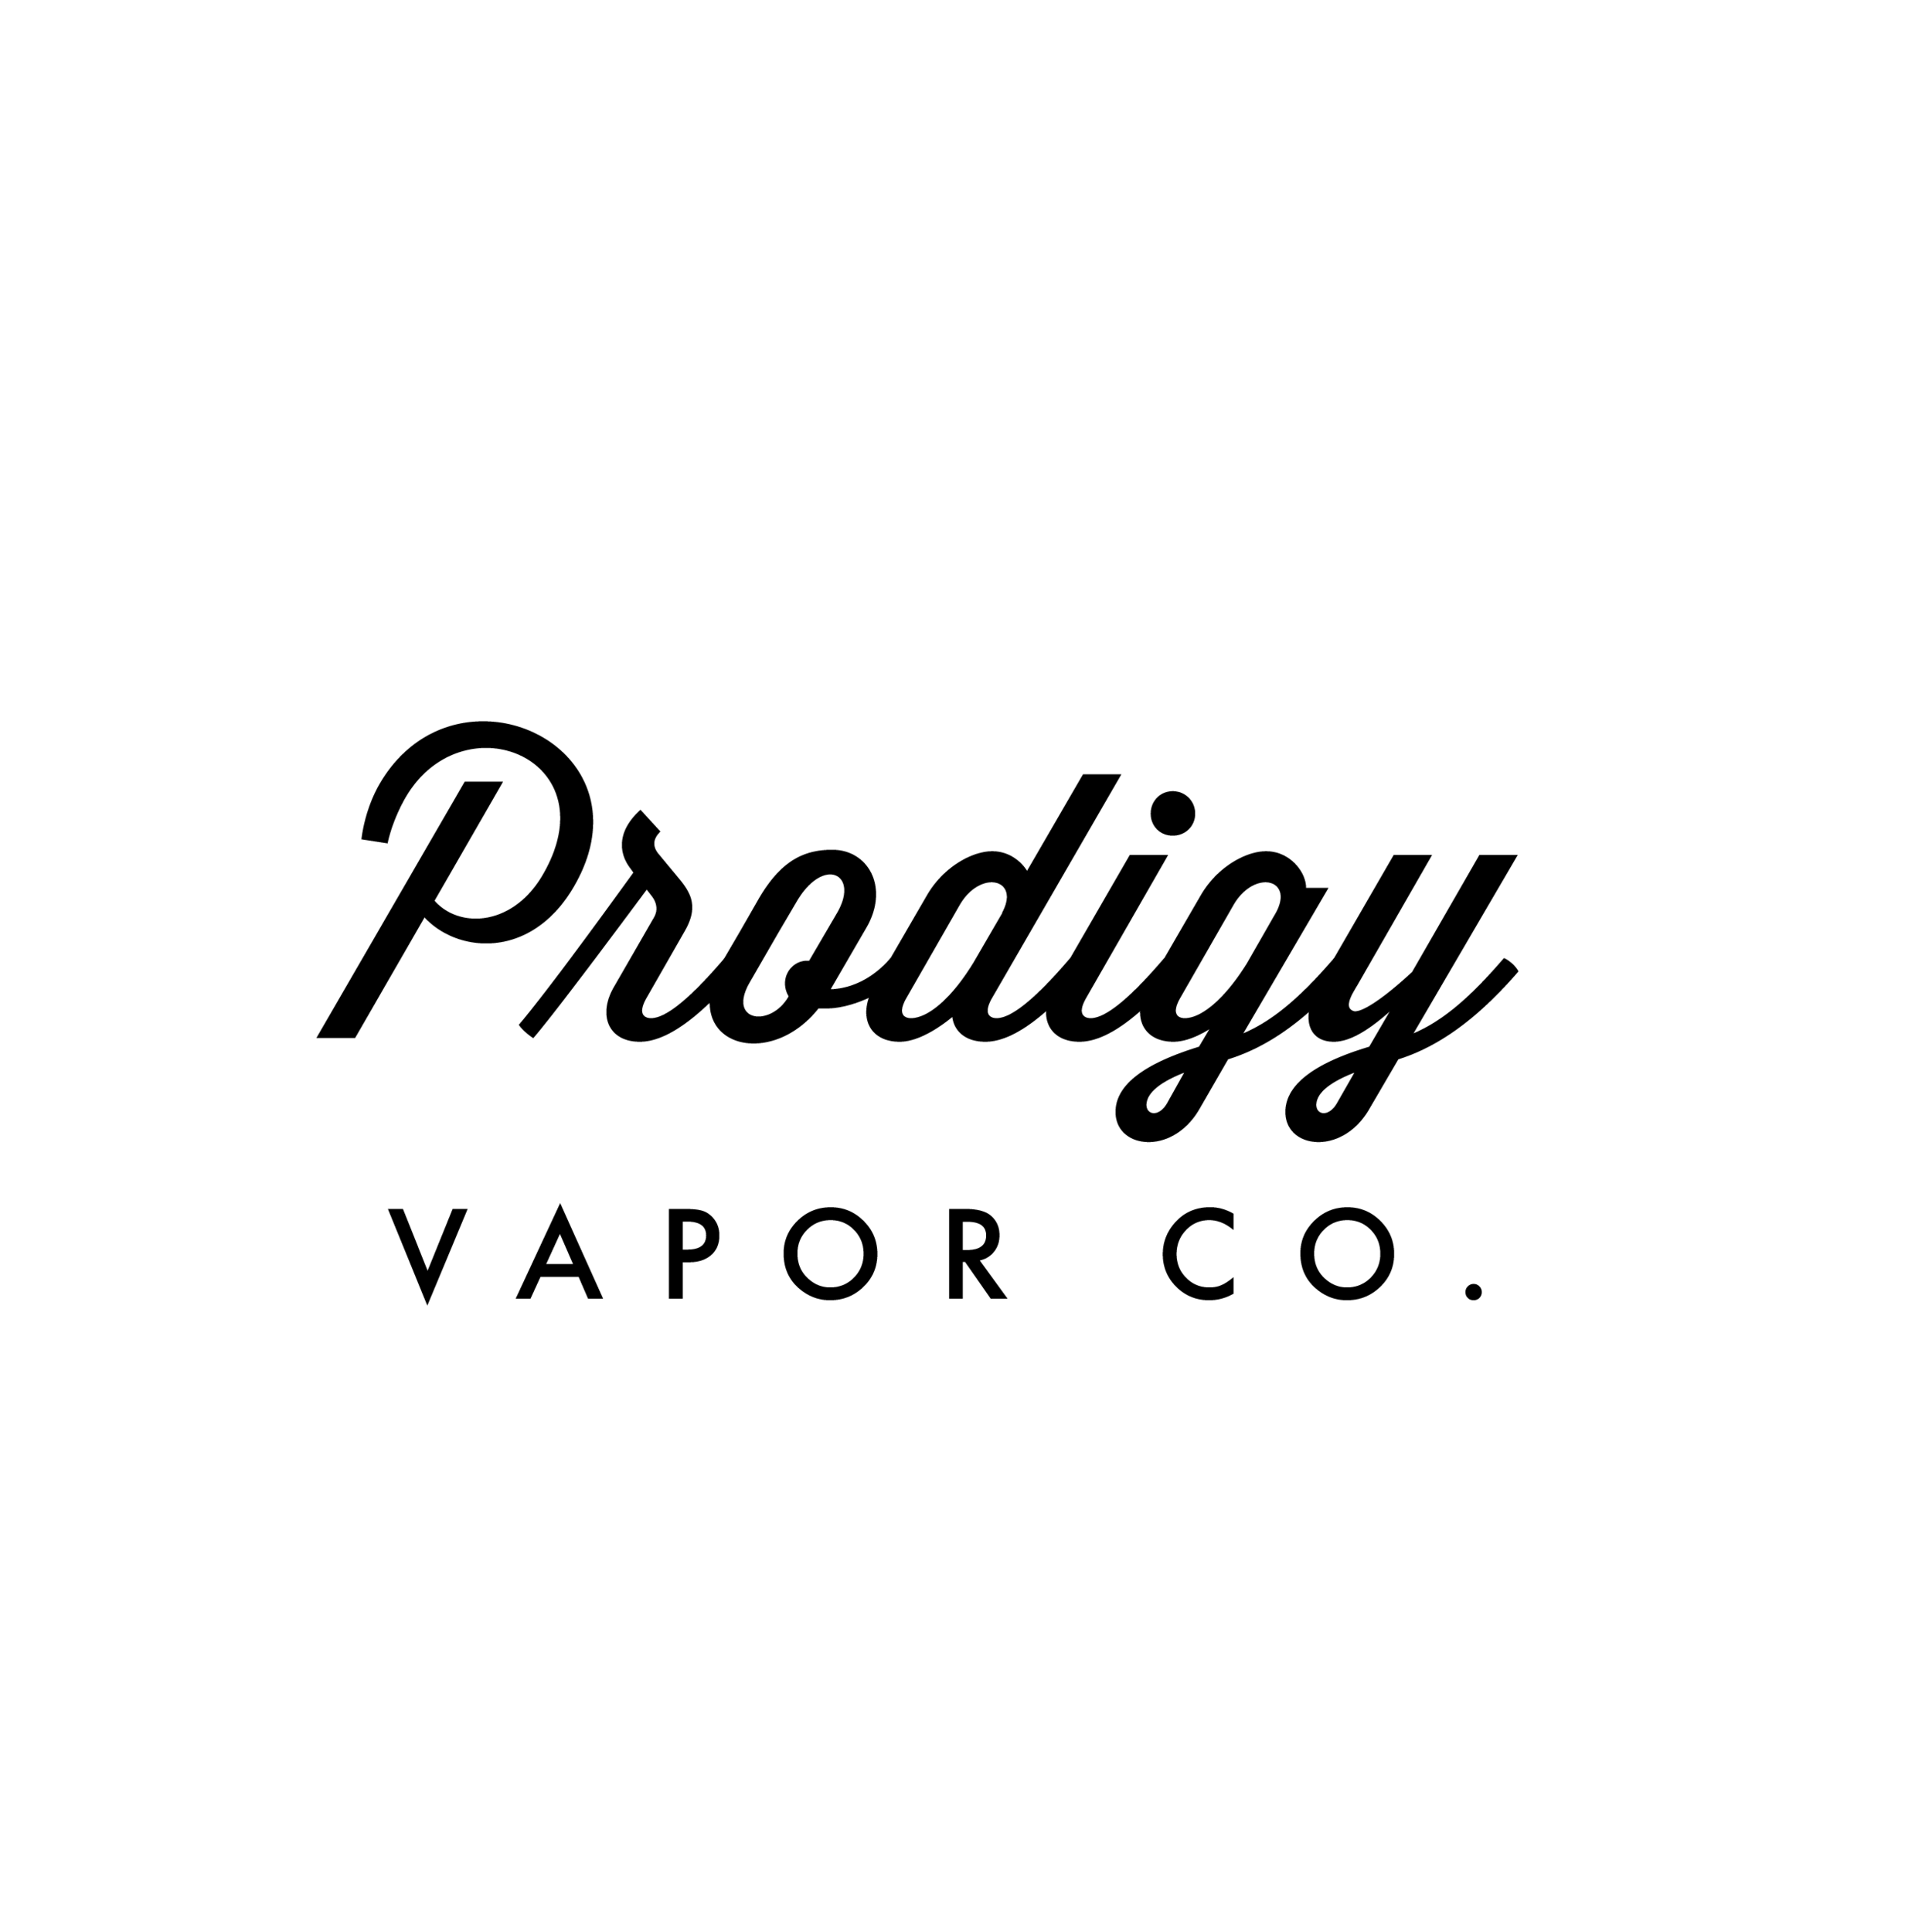 prodigy_logo_2017-02.png